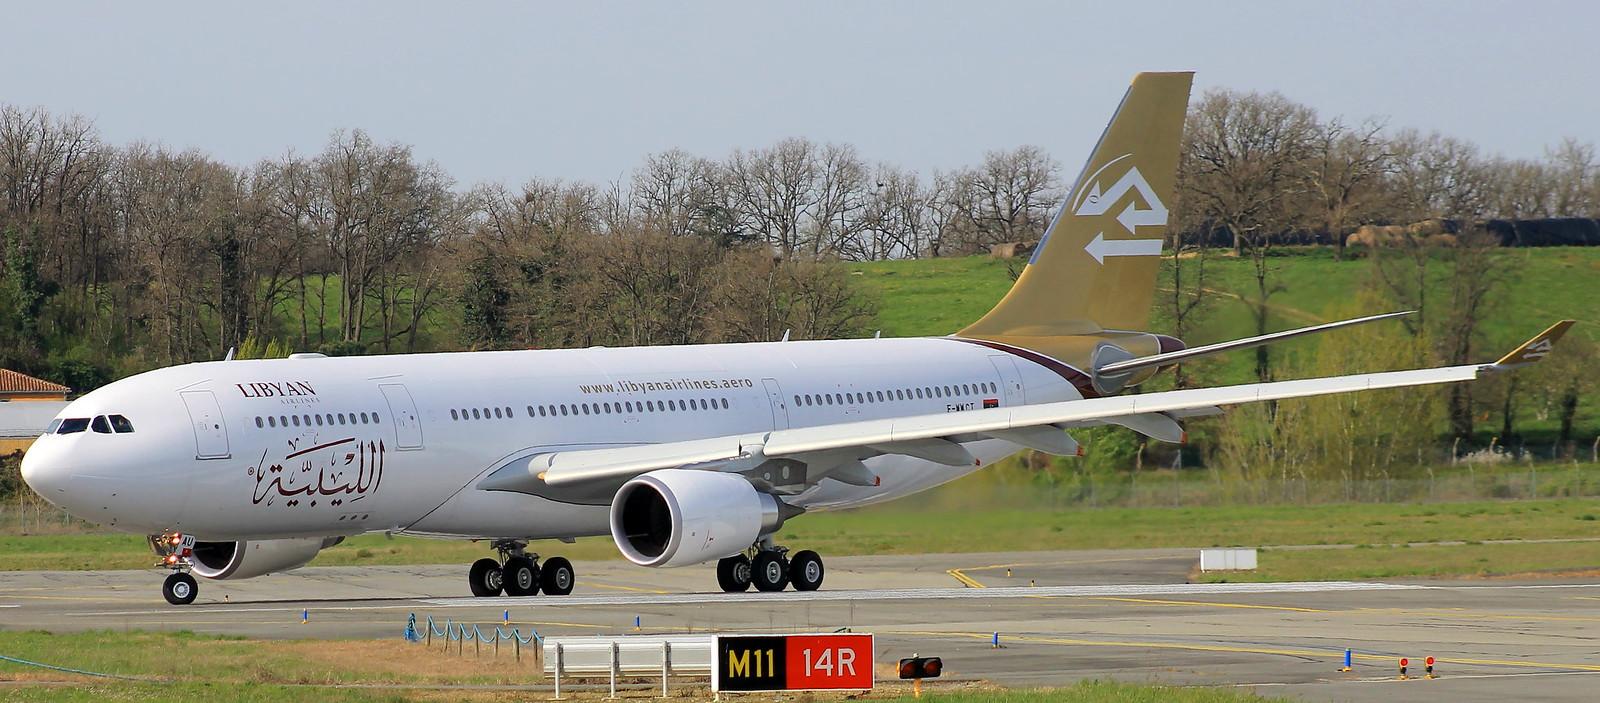 A330-200 LIBYAN AIRLINES F-WWCT MSN 1543 FUTUR 5A-LAU